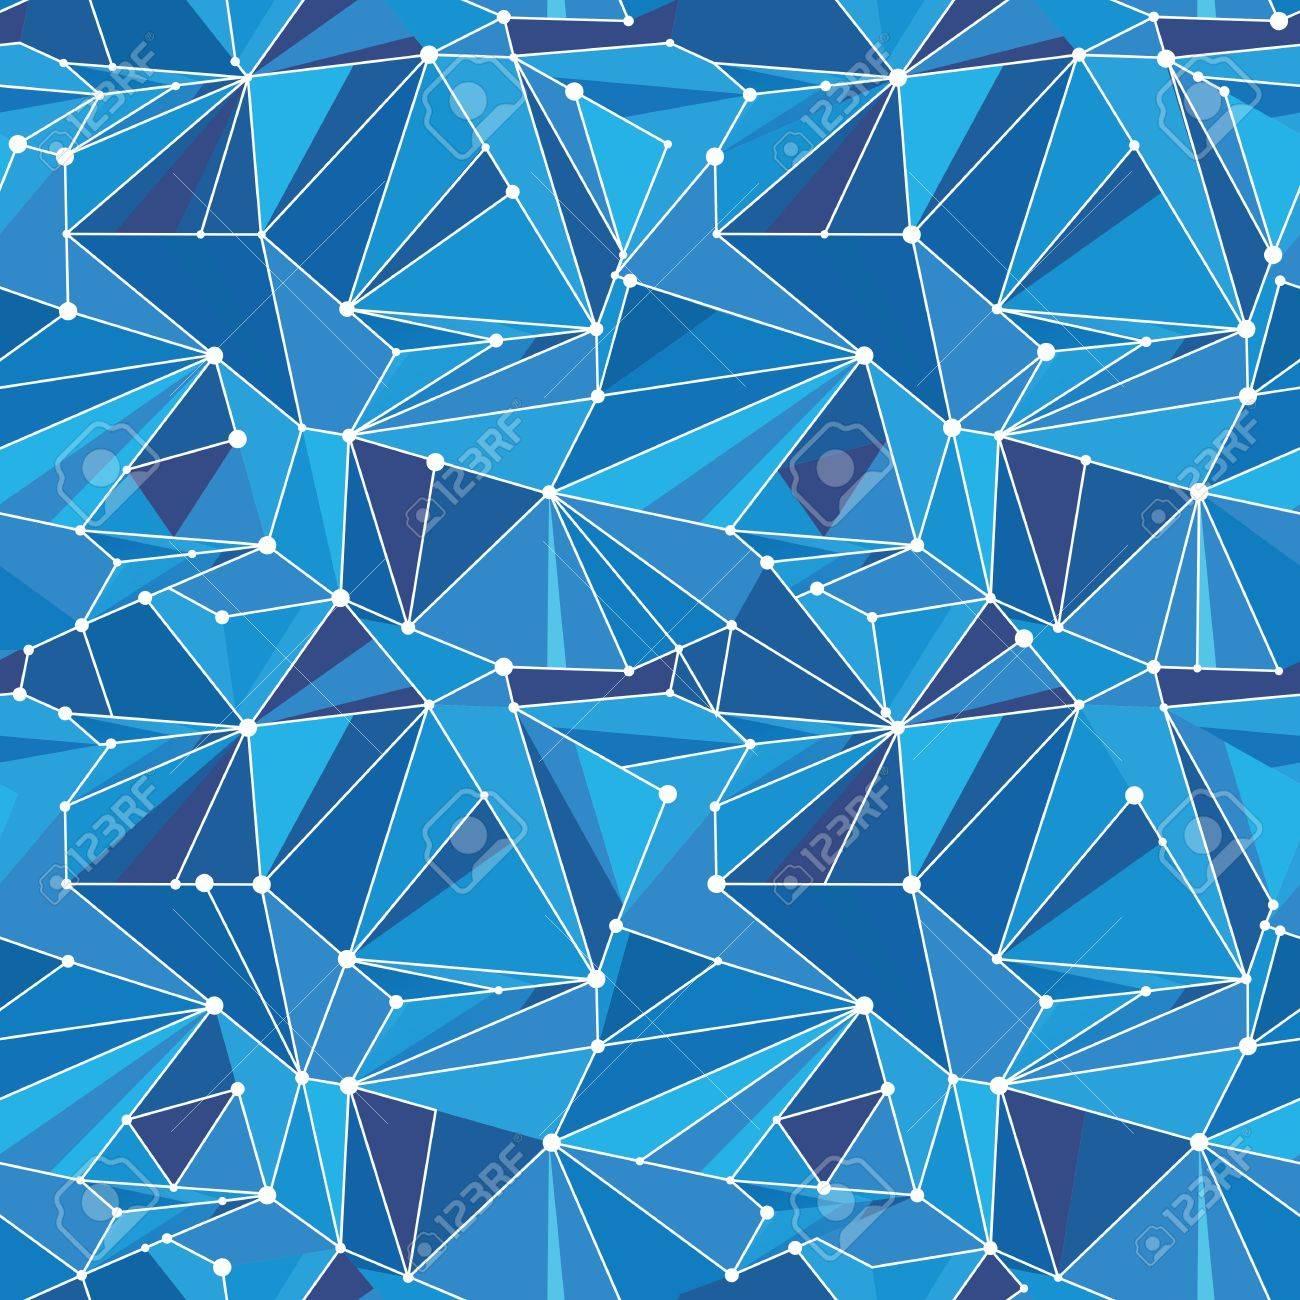 business texture